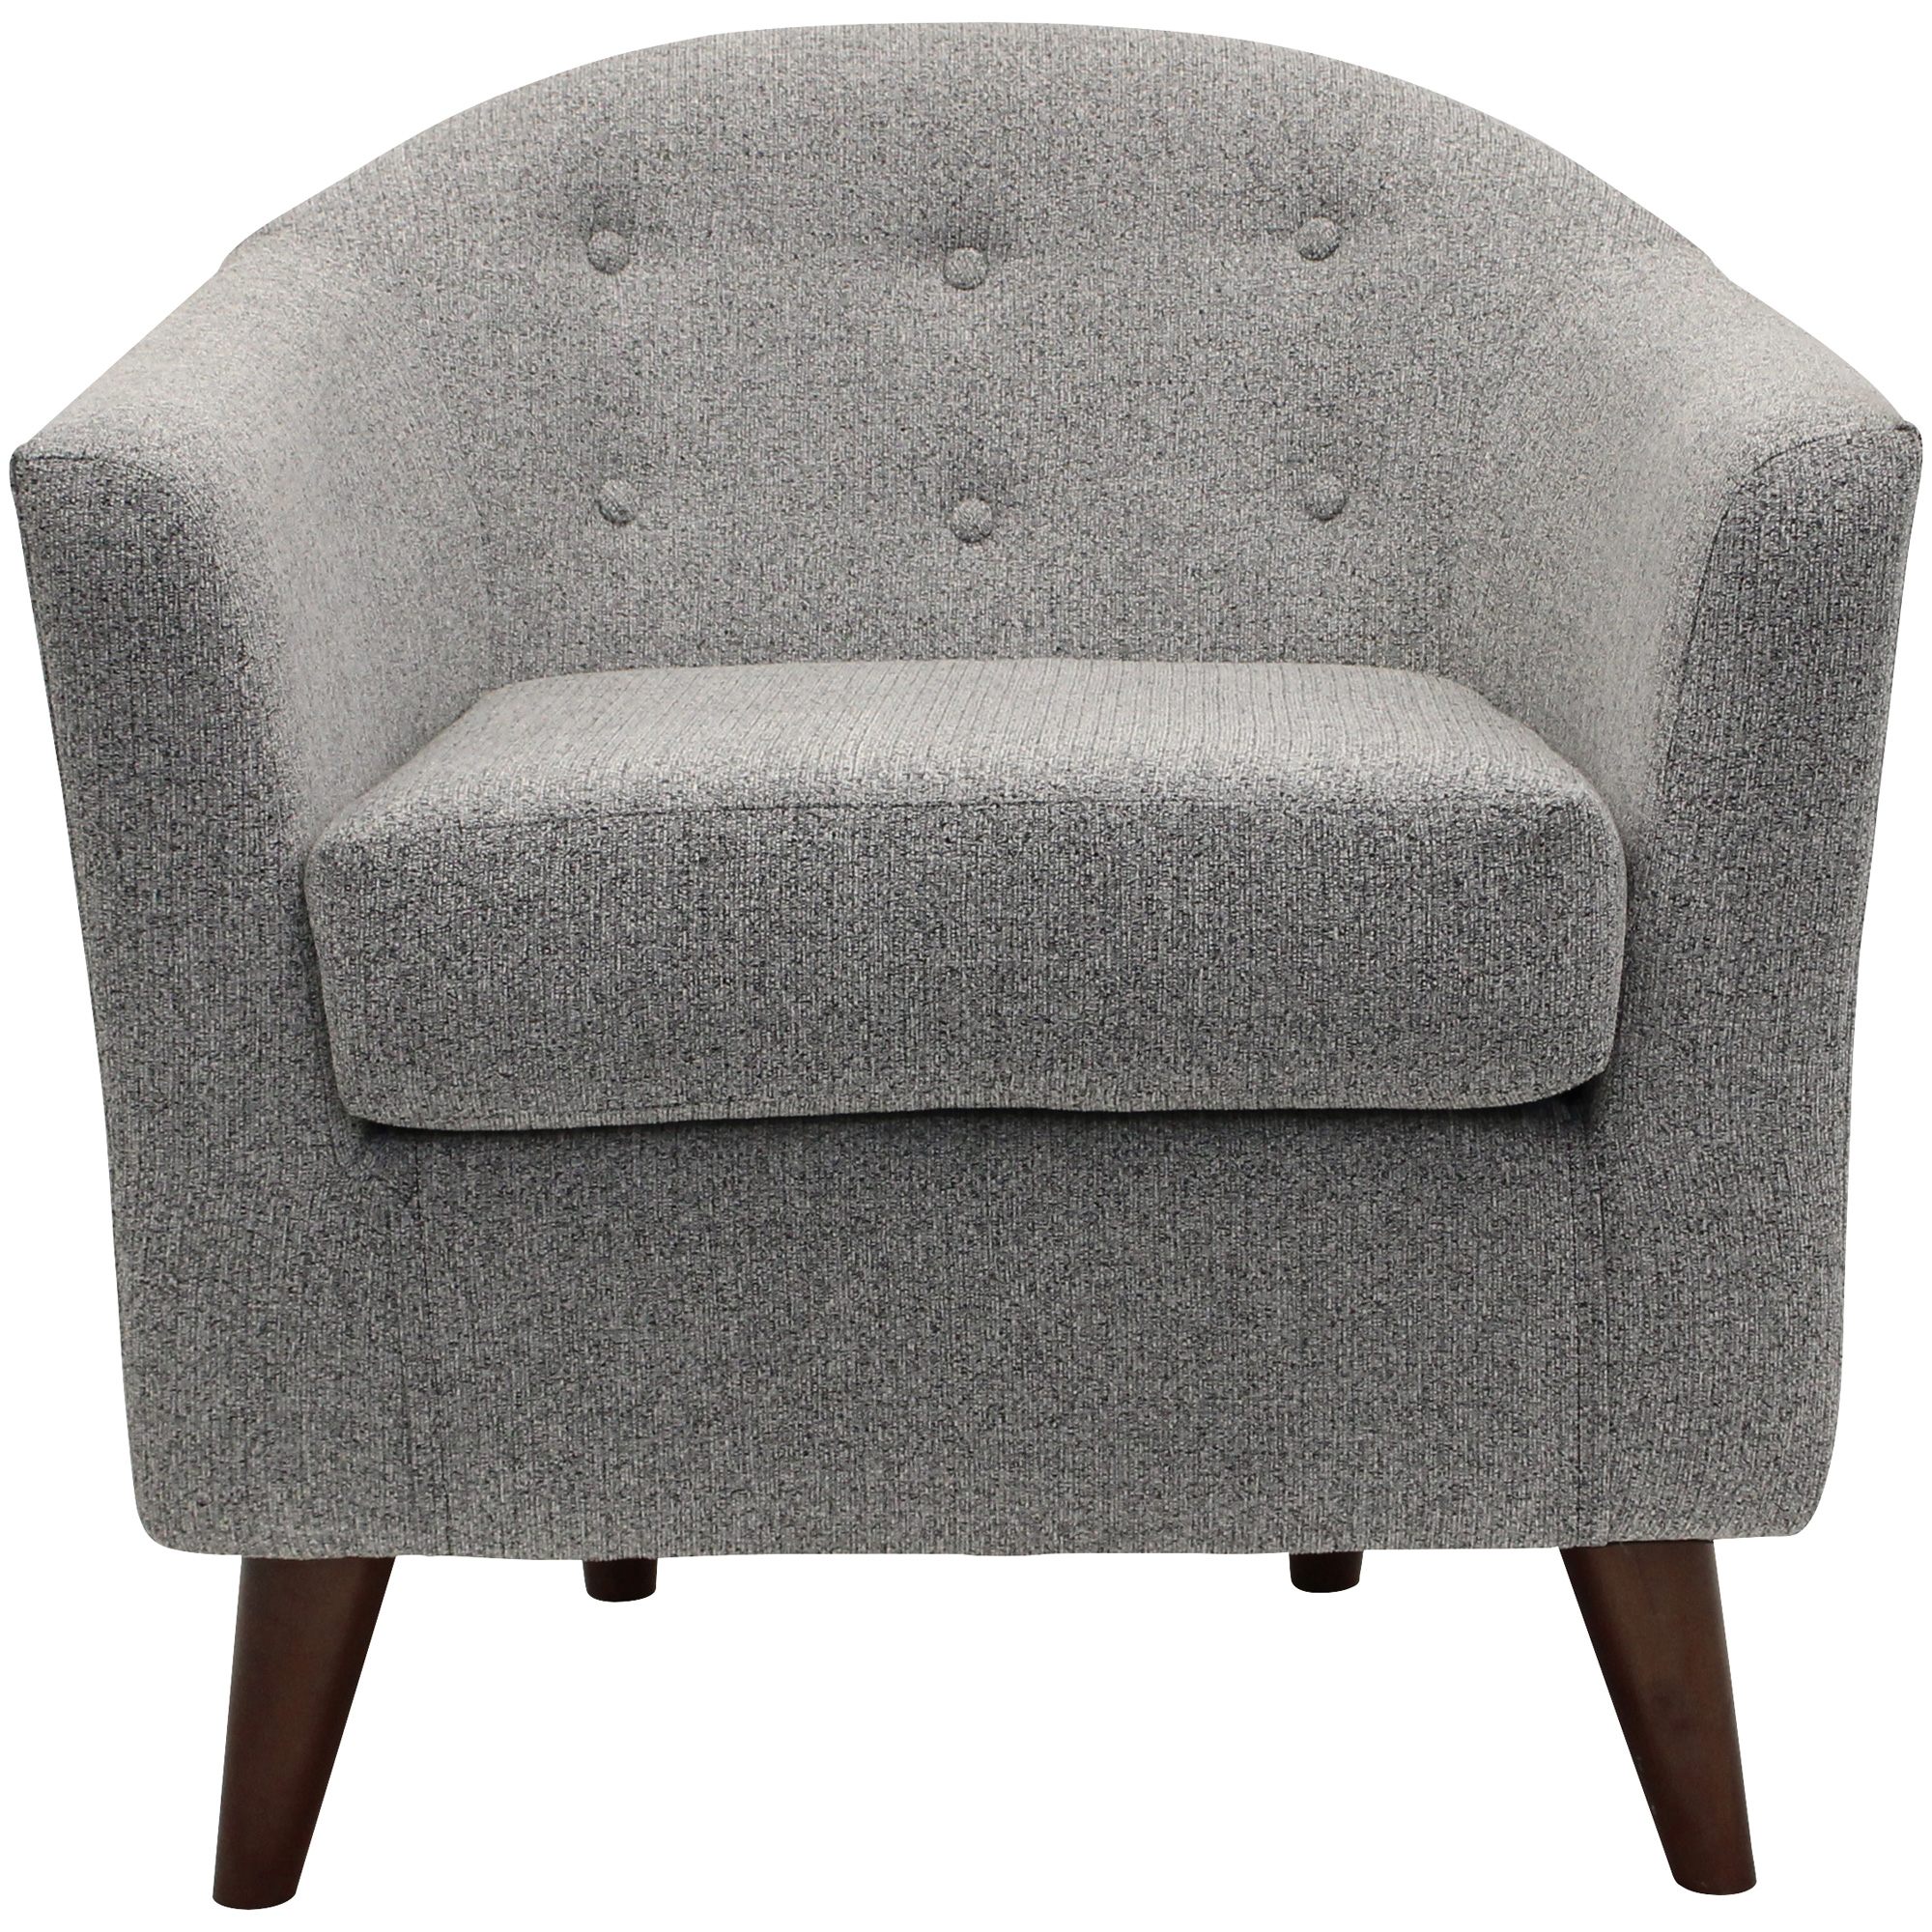 Overman | Marissa Ash Accent Chair